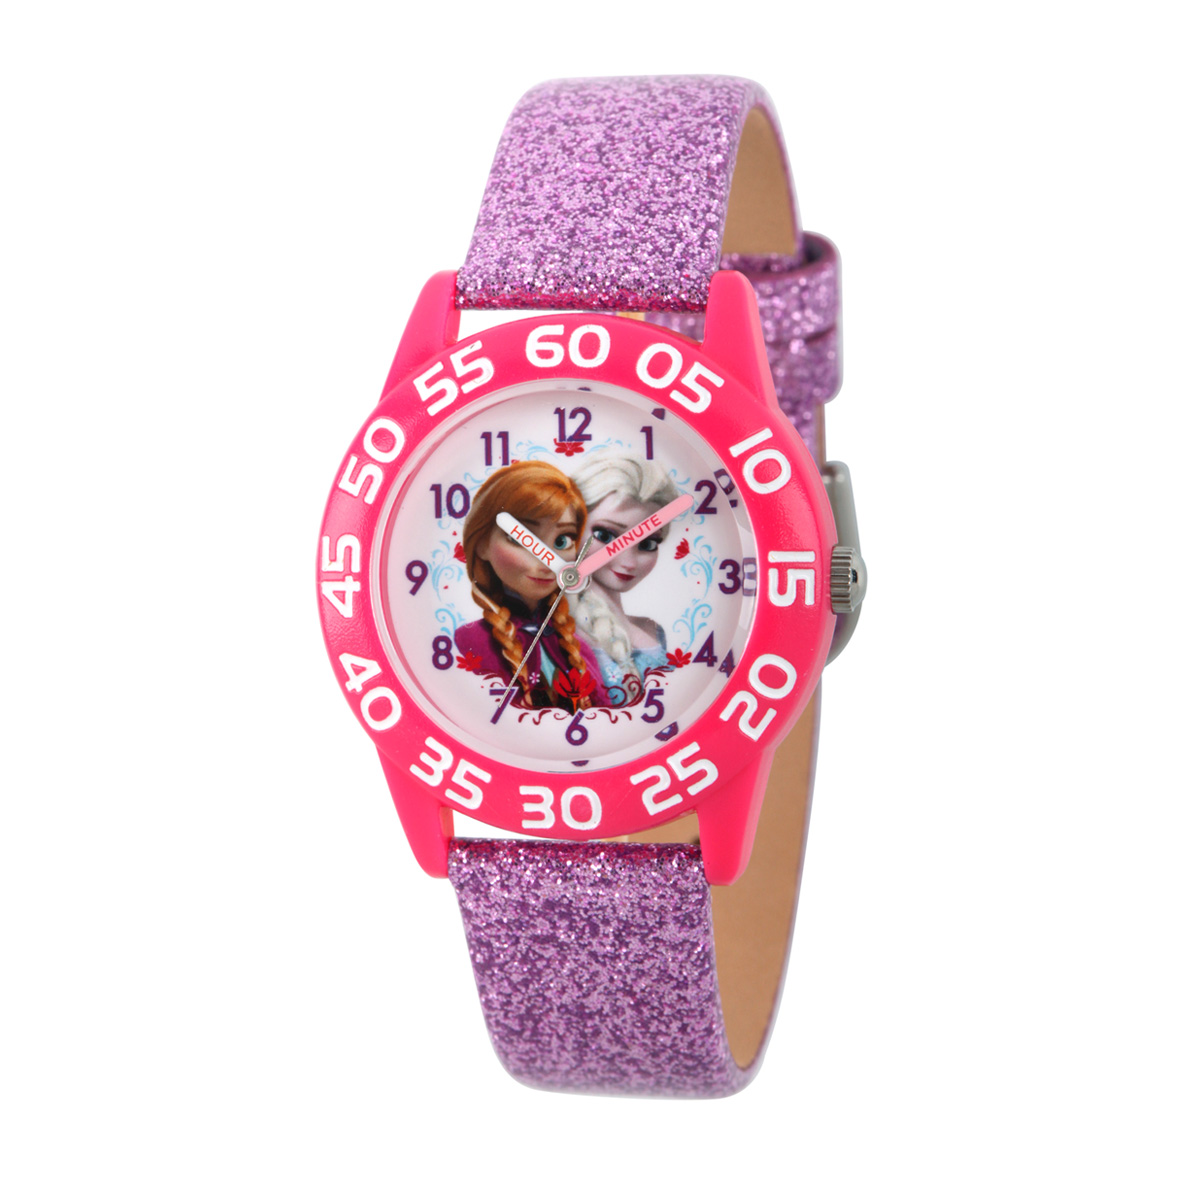 DIW002421_disney-marvel_watches.jpg